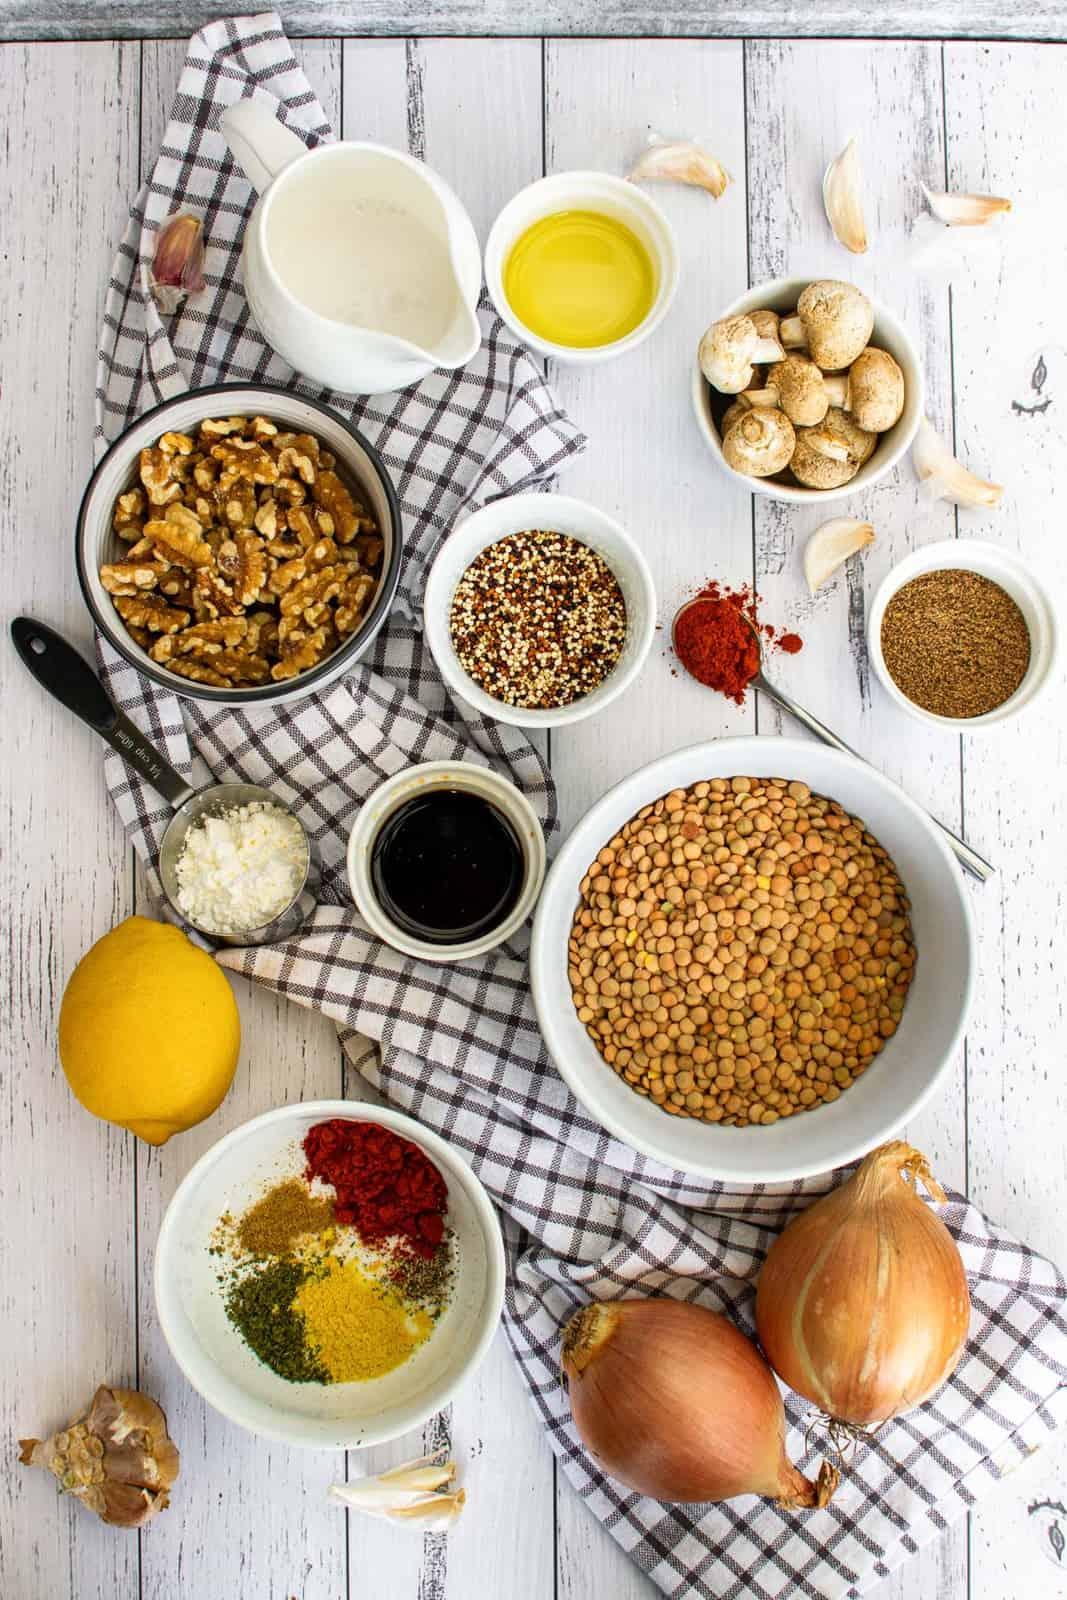 ingredients to make lentil cakes